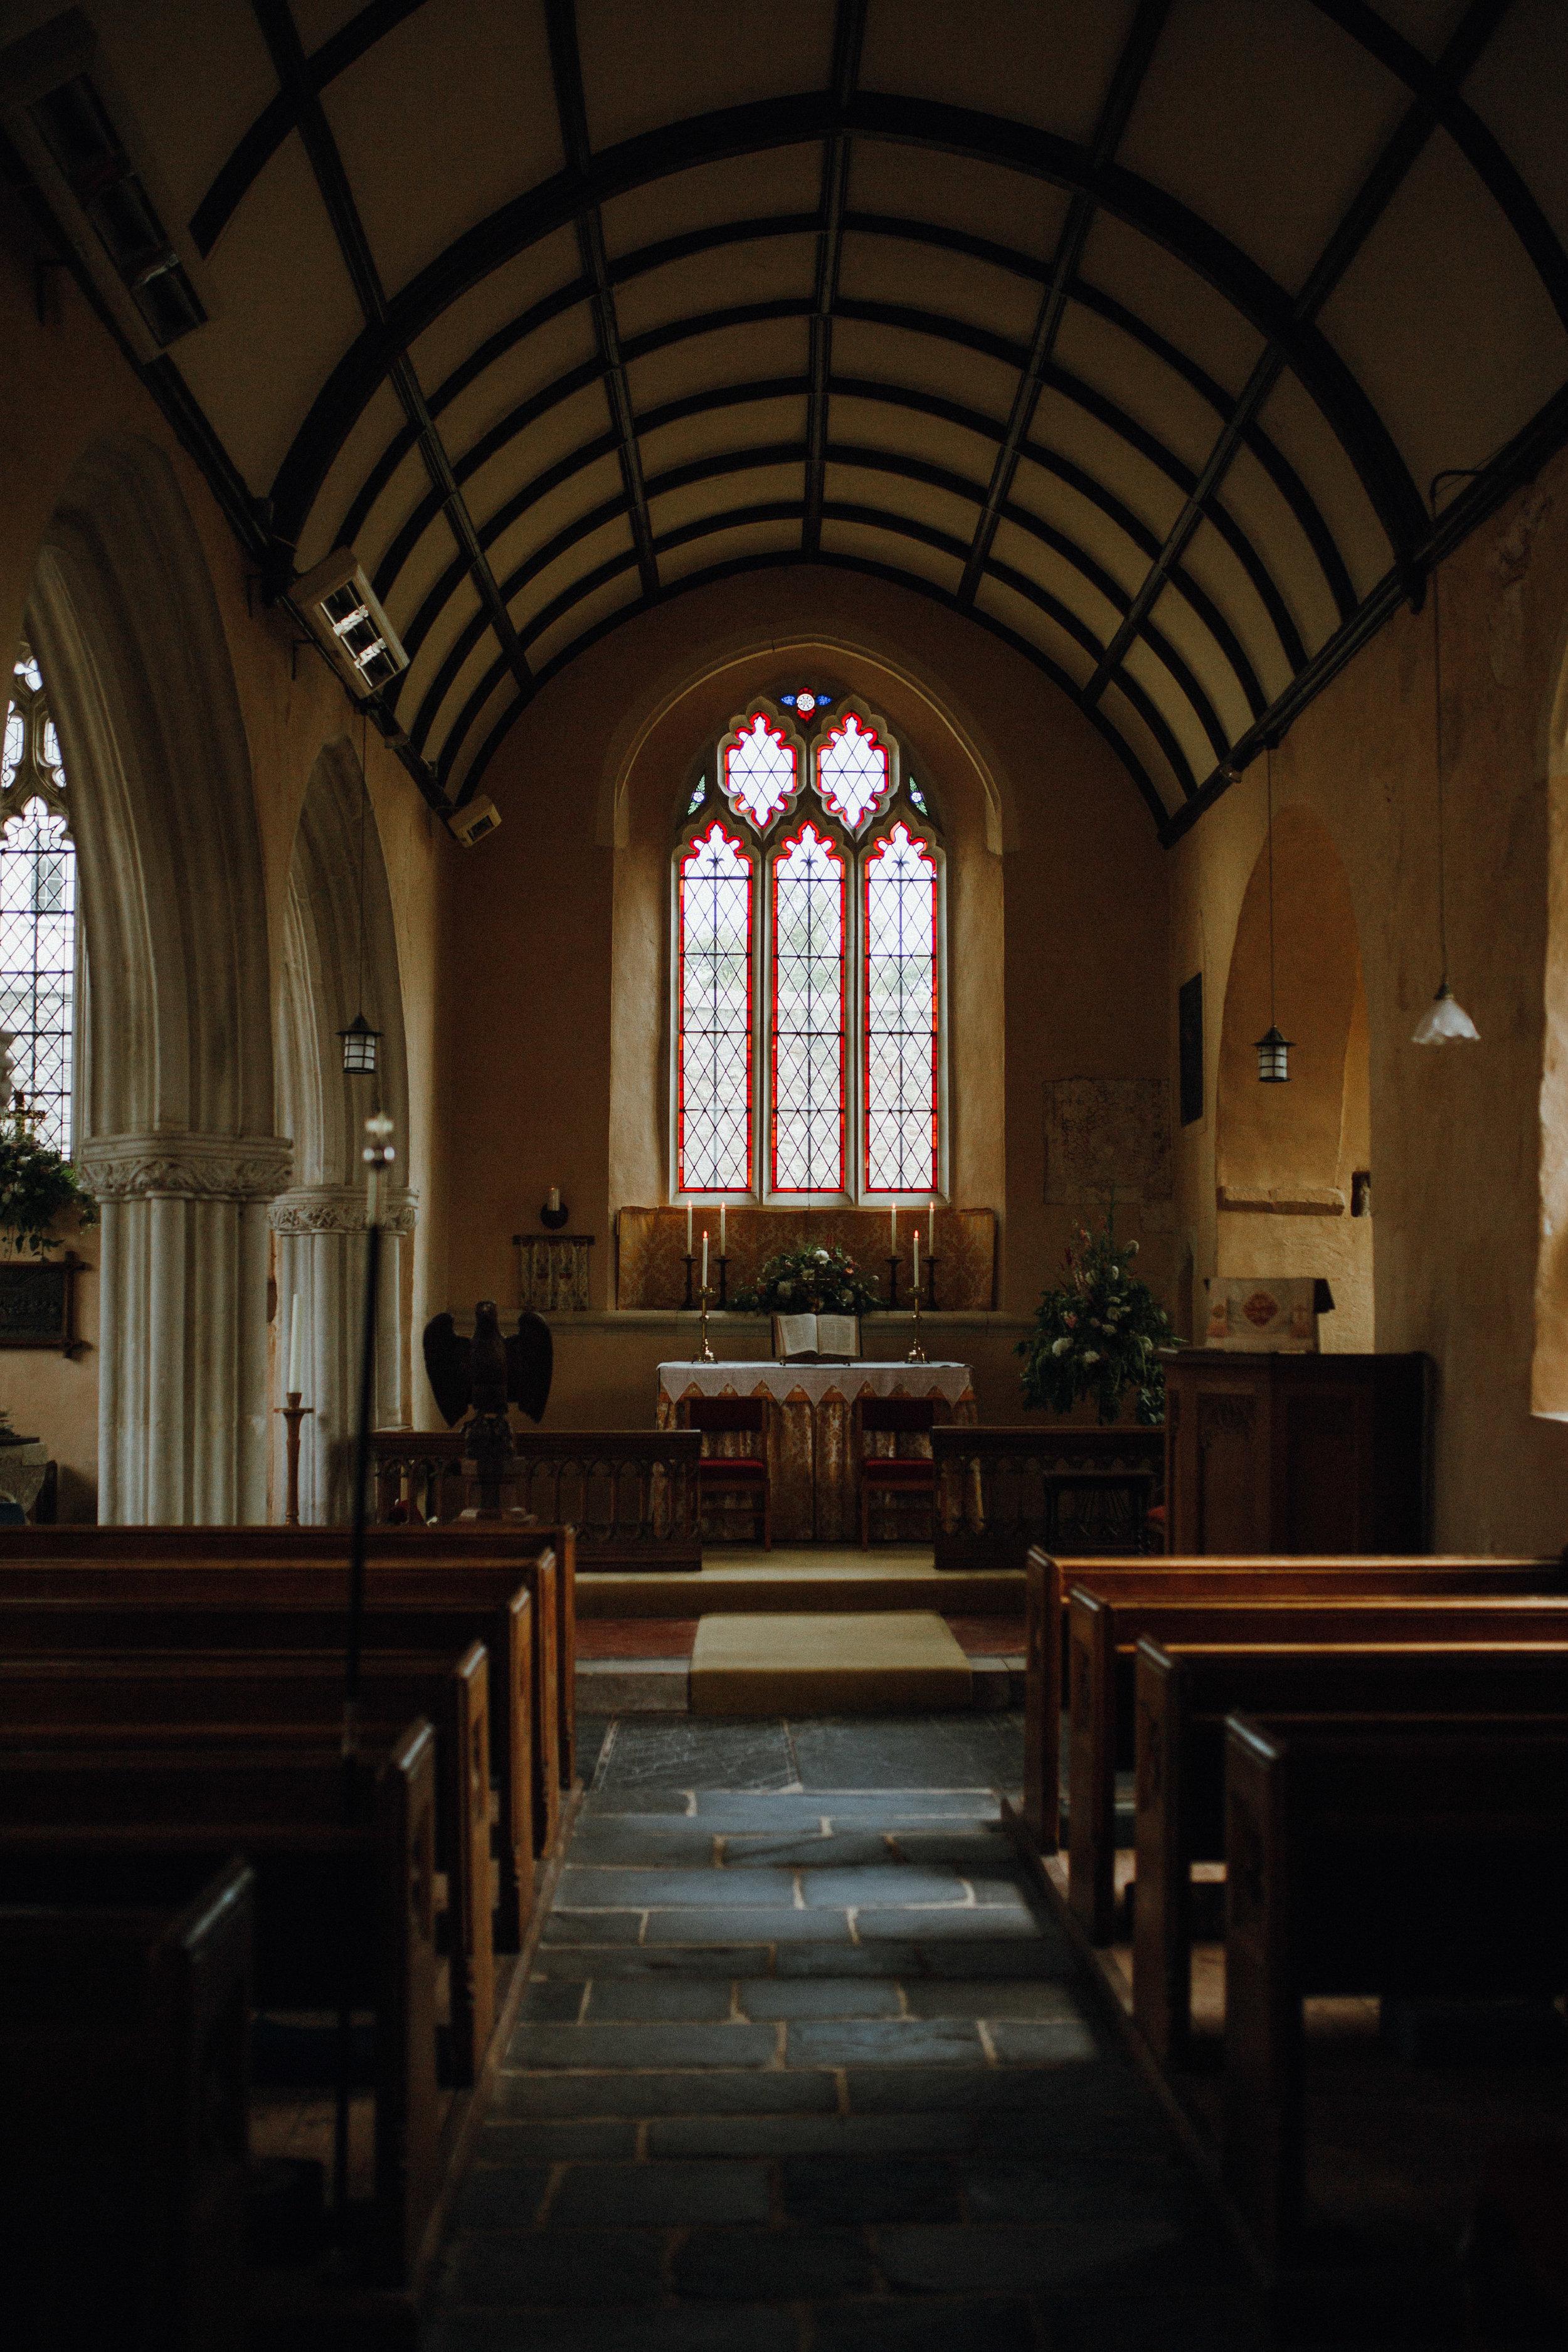 Coffinswell church